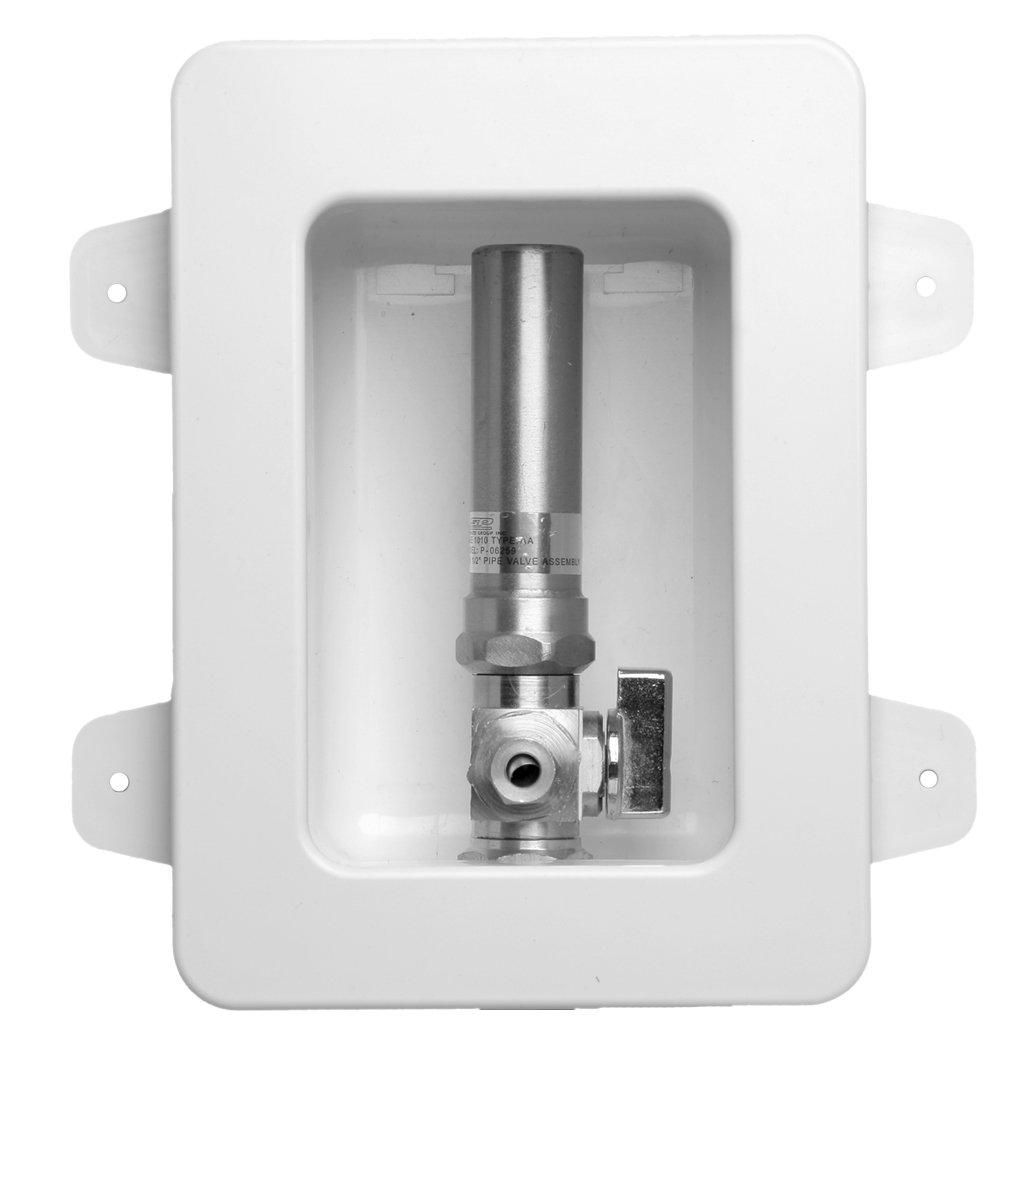 LSP OBFS-8130-LL Ice Maker Box, Firestop White